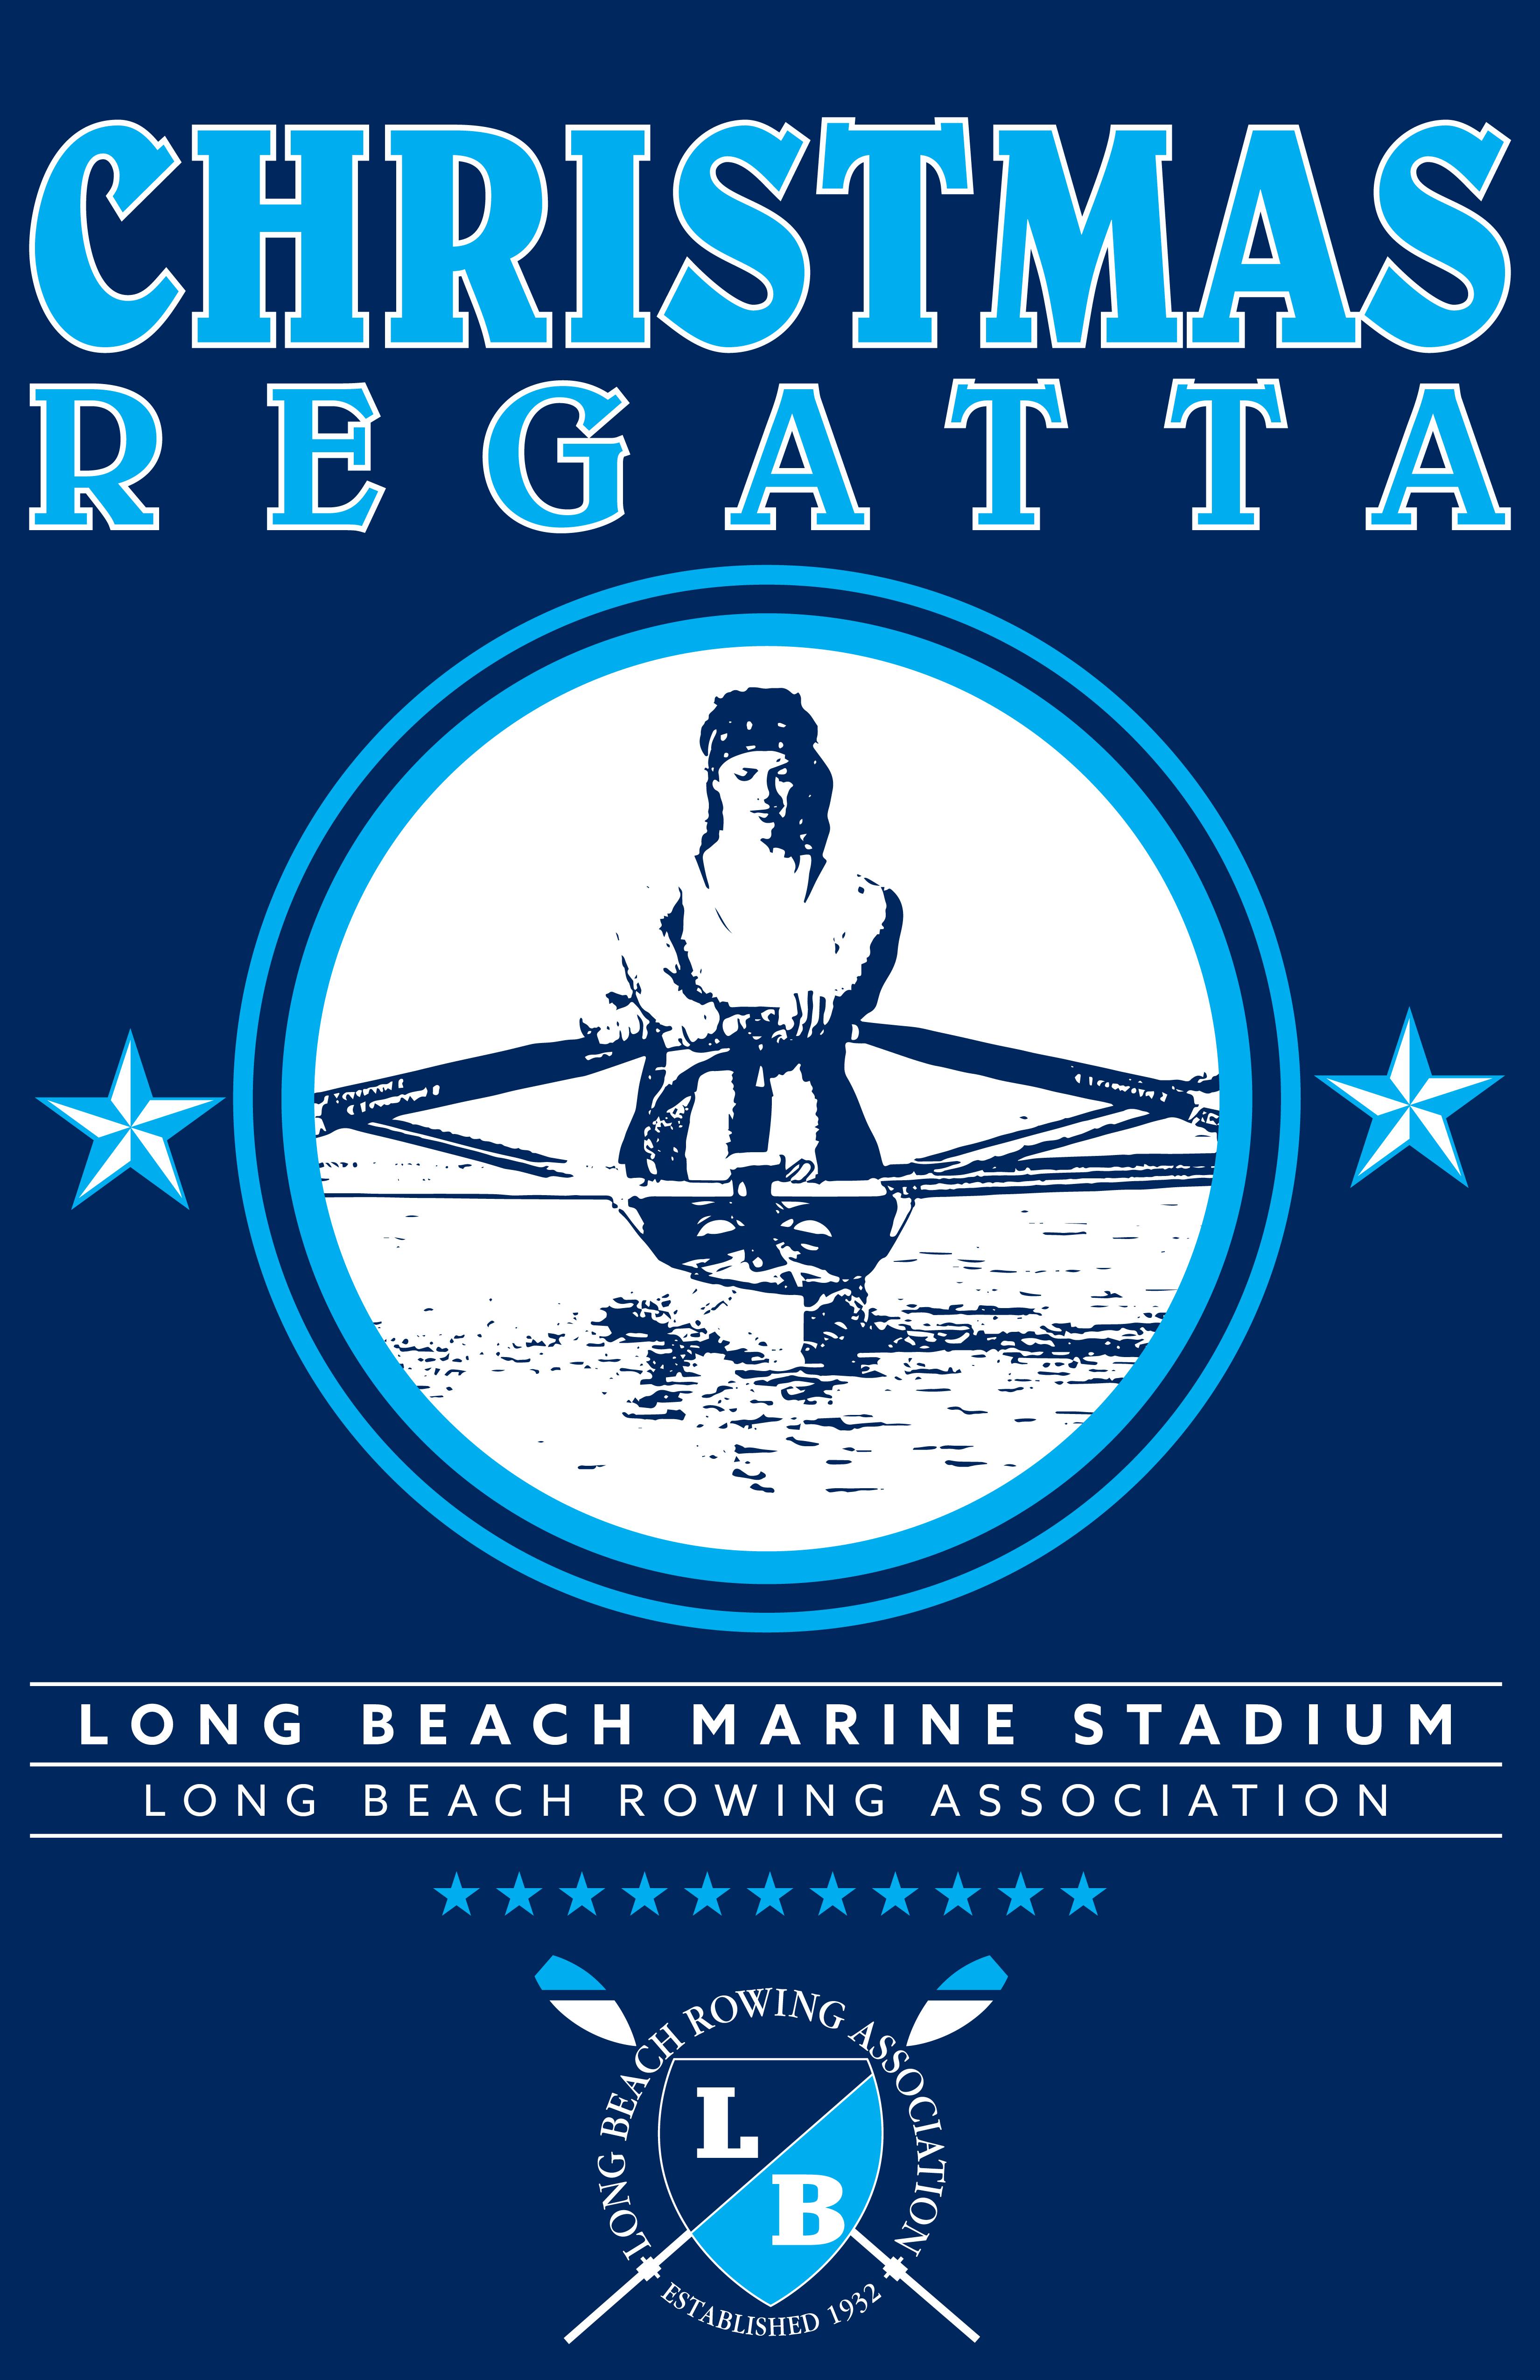 Christmas Regatta – Long Beach Rowing Association